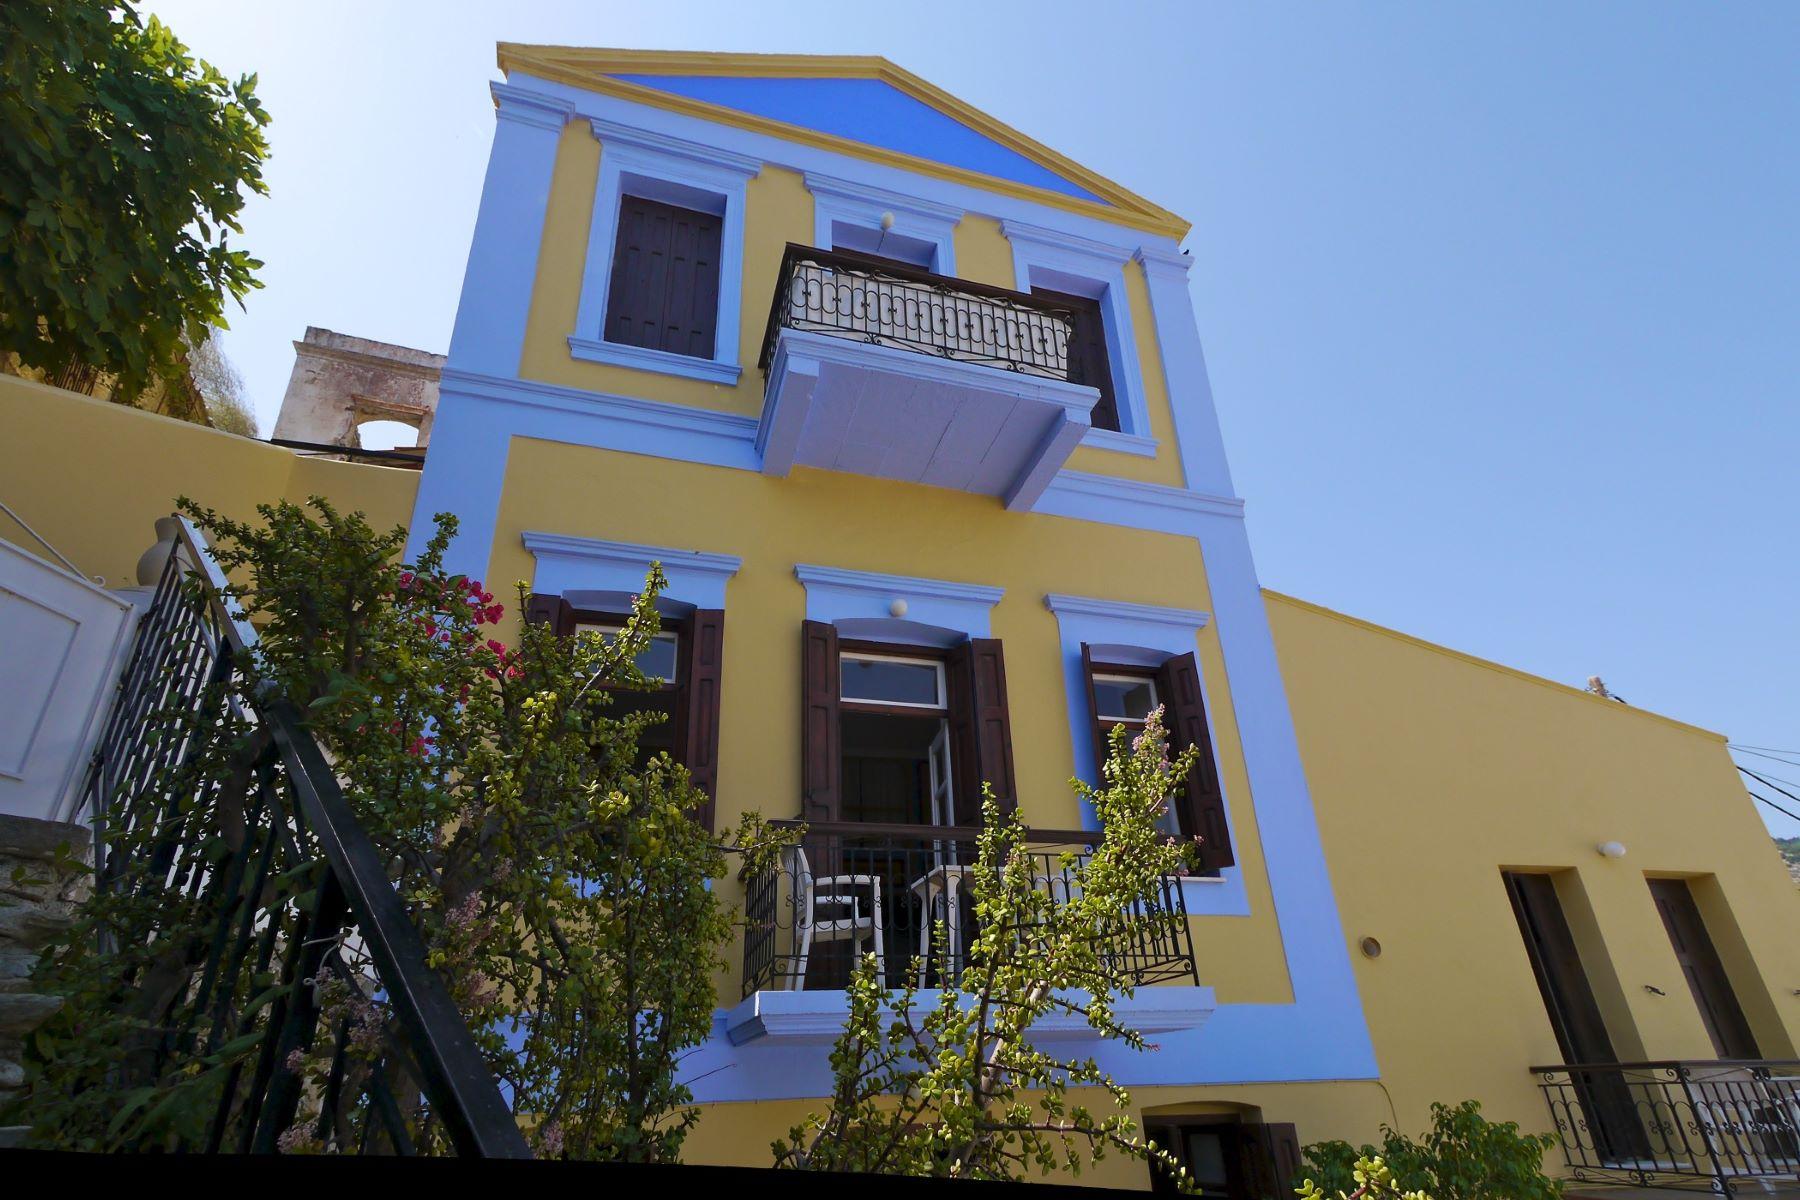 独户住宅 为 销售 在 Neoclassical Elegance Symi, Dodecanese, 希腊